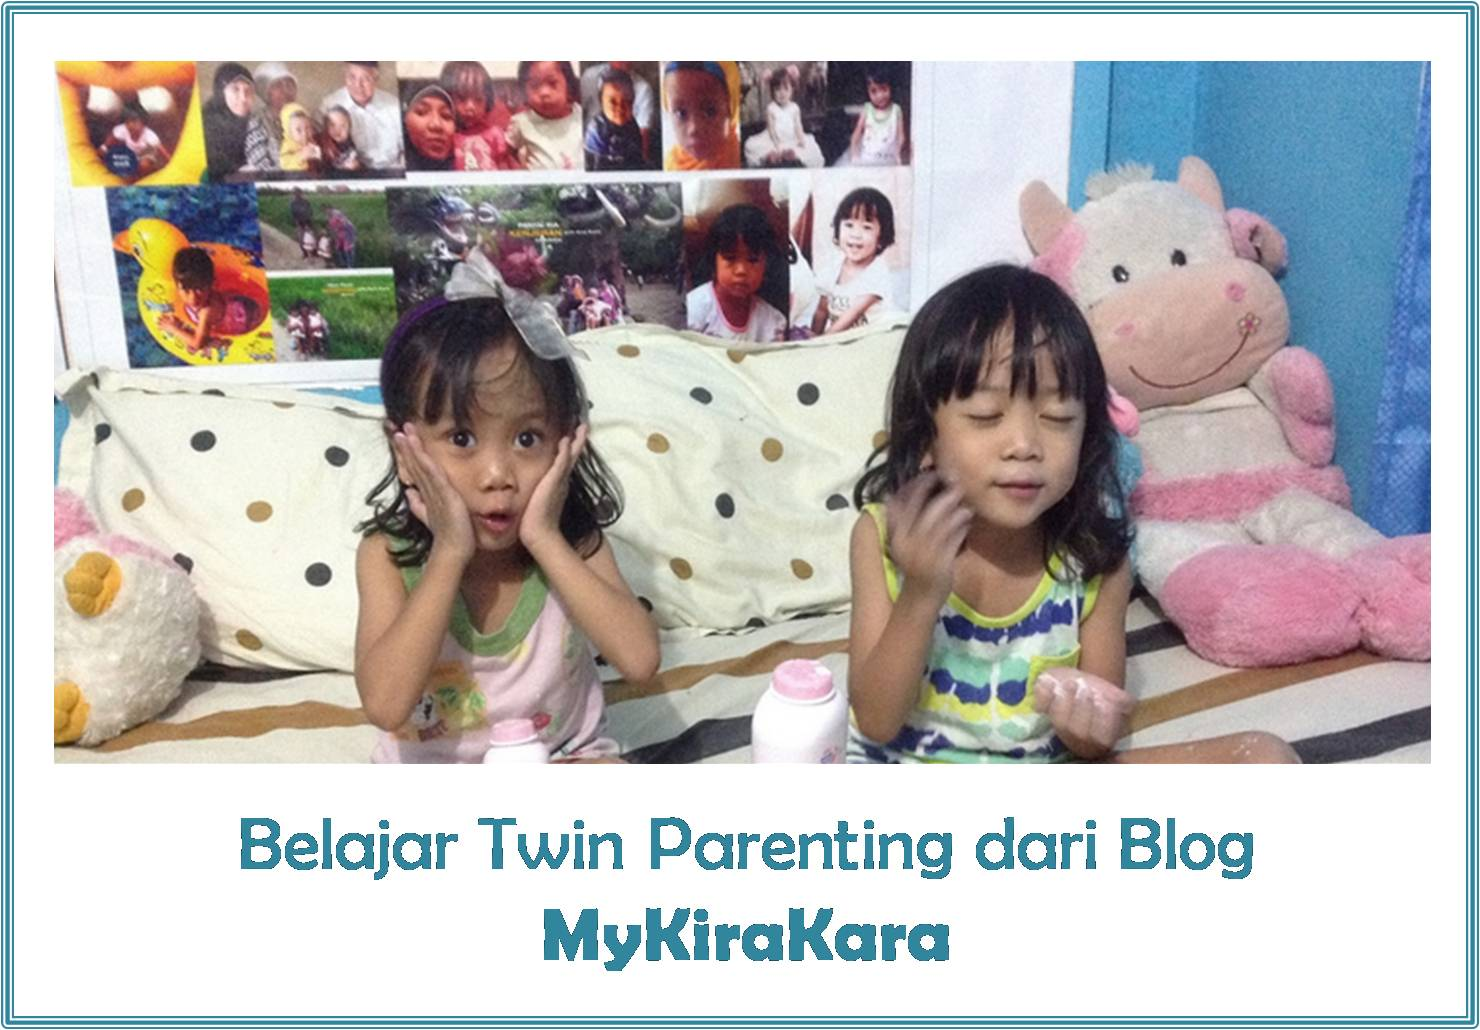 Blog twin parenting mykirakara Wiwid Wadmira